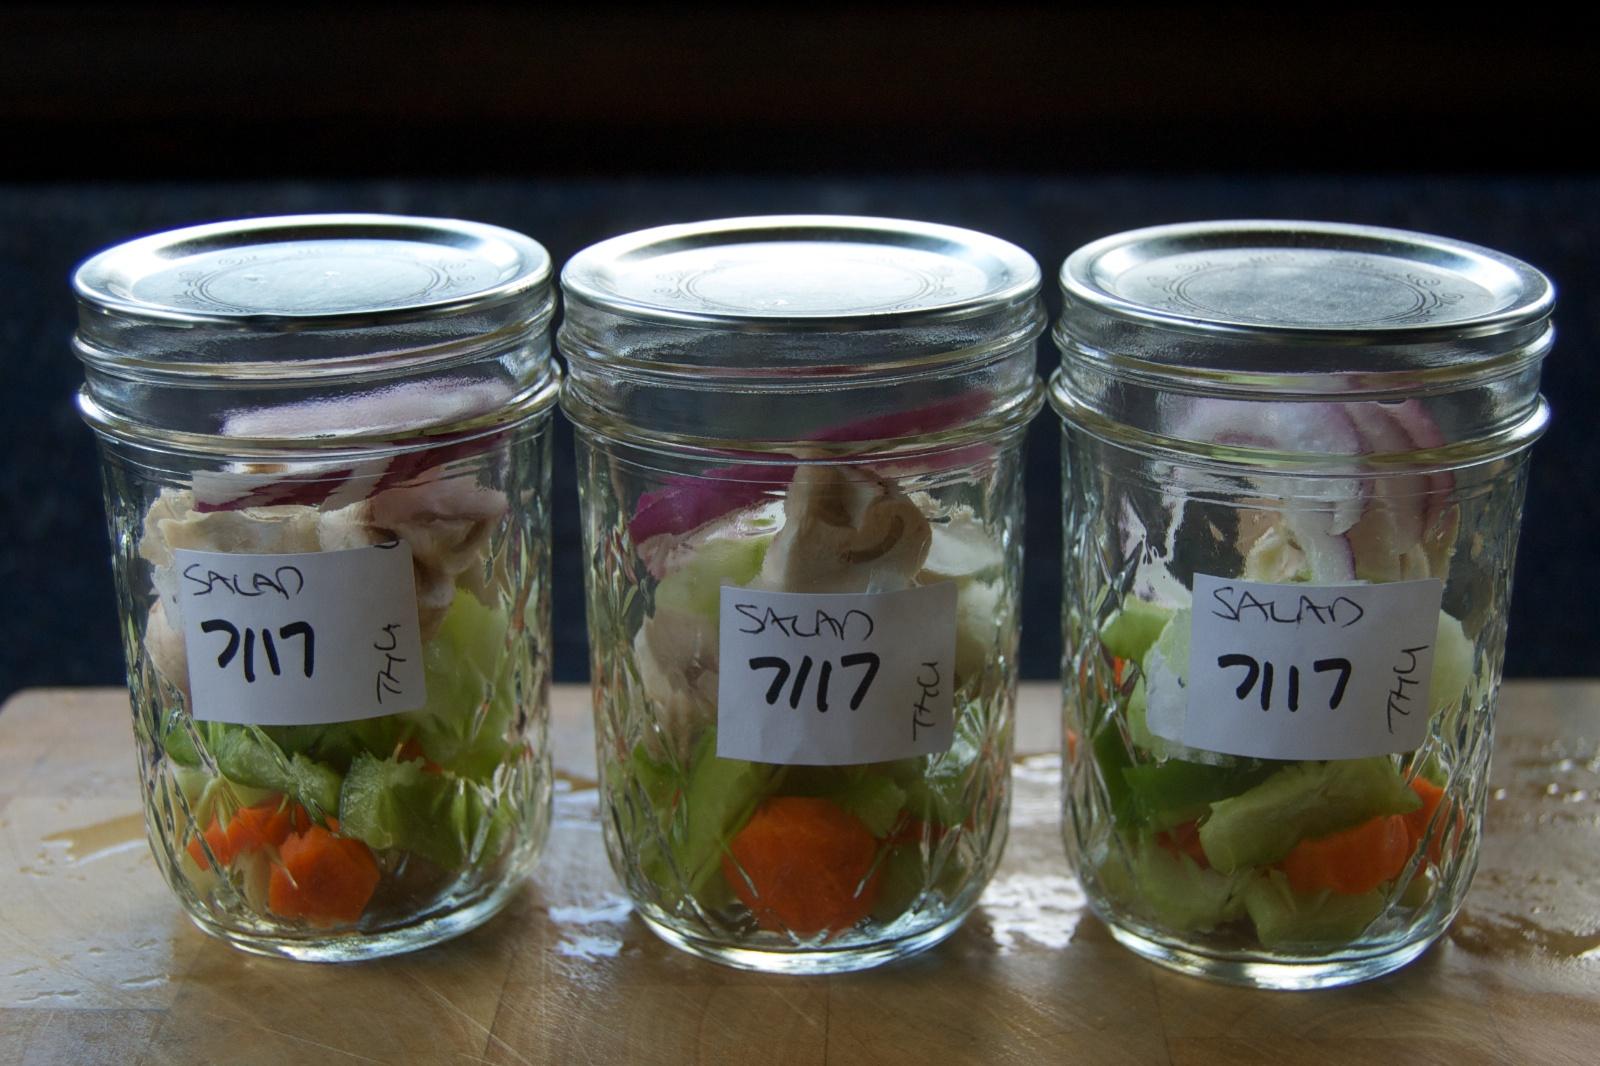 http://blog.rickk.com/food/2014/07/17/ate.2014.07.17.c2.jpg